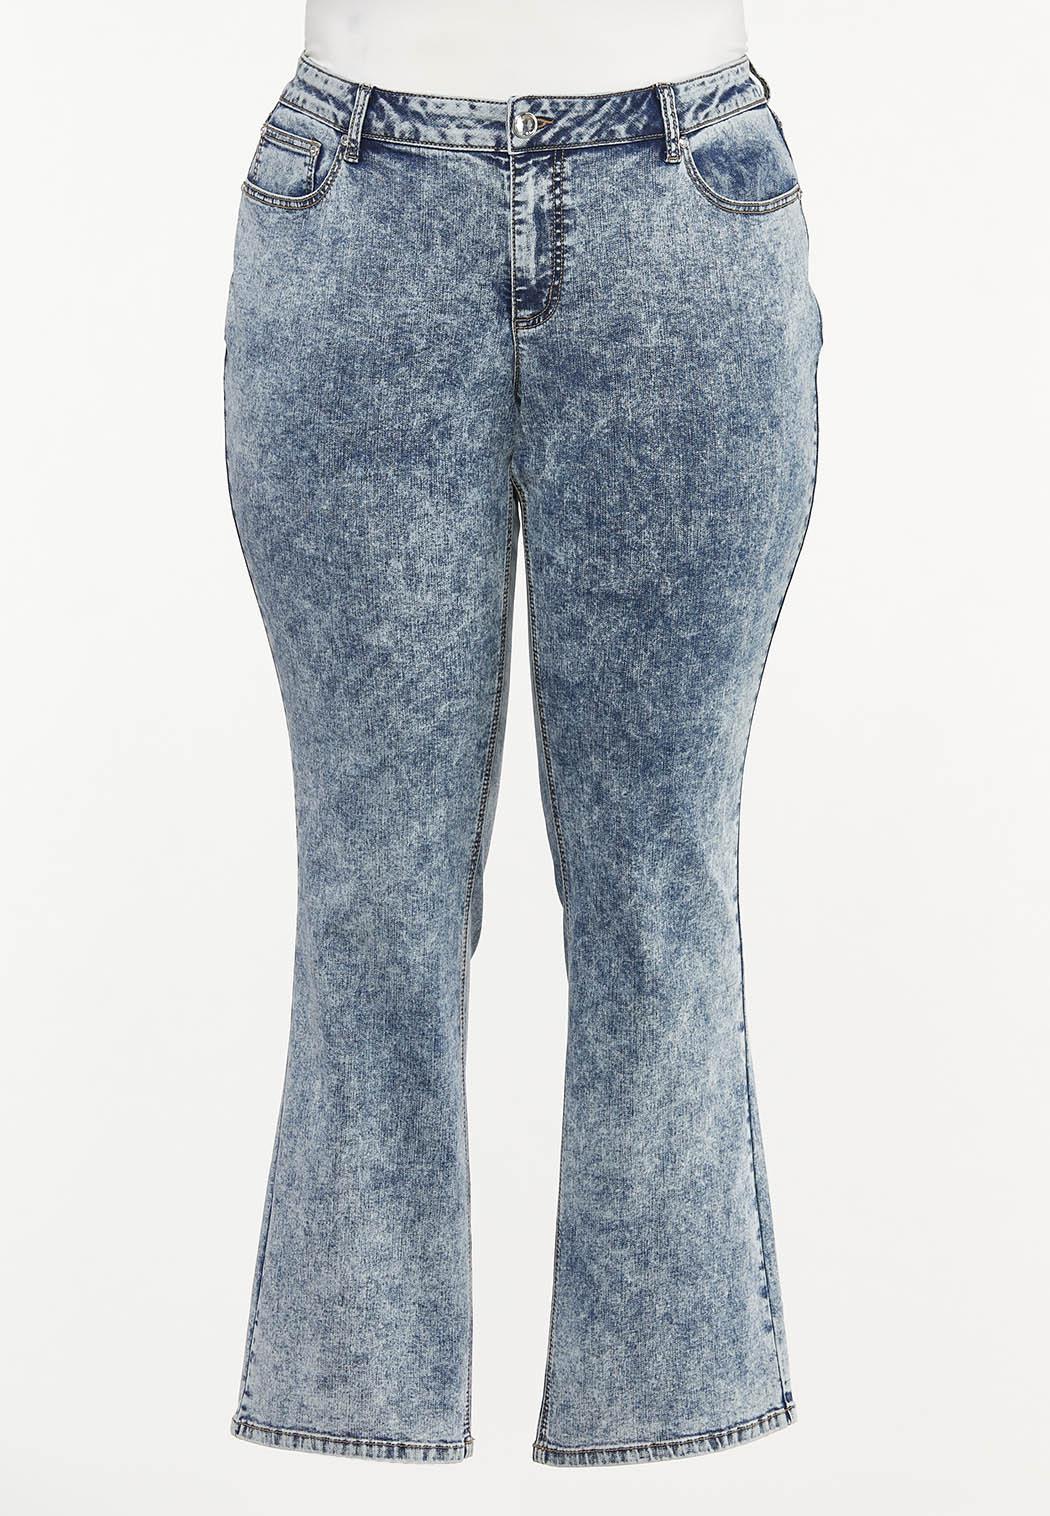 Plus Petite Dark Vintage Wash Jeans (Item #44510852)